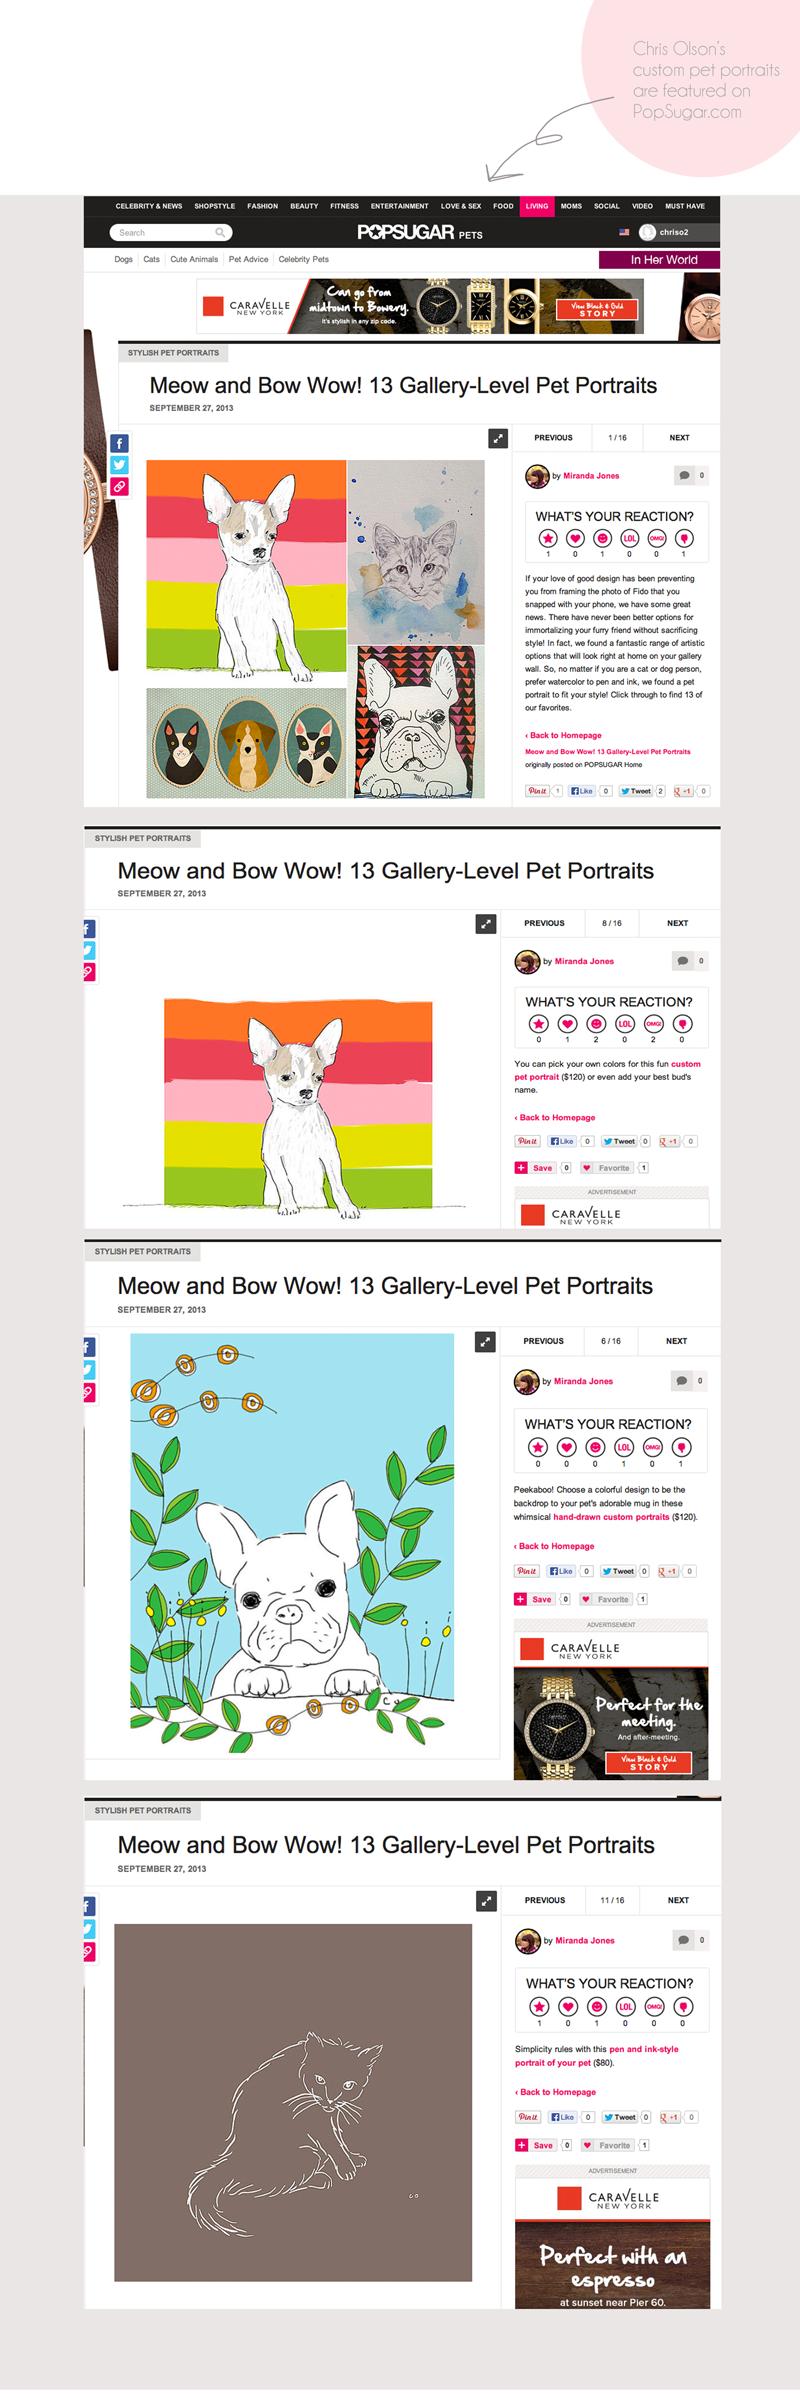 Chris Olson's custom pet portraits featured on PopSugar.com.